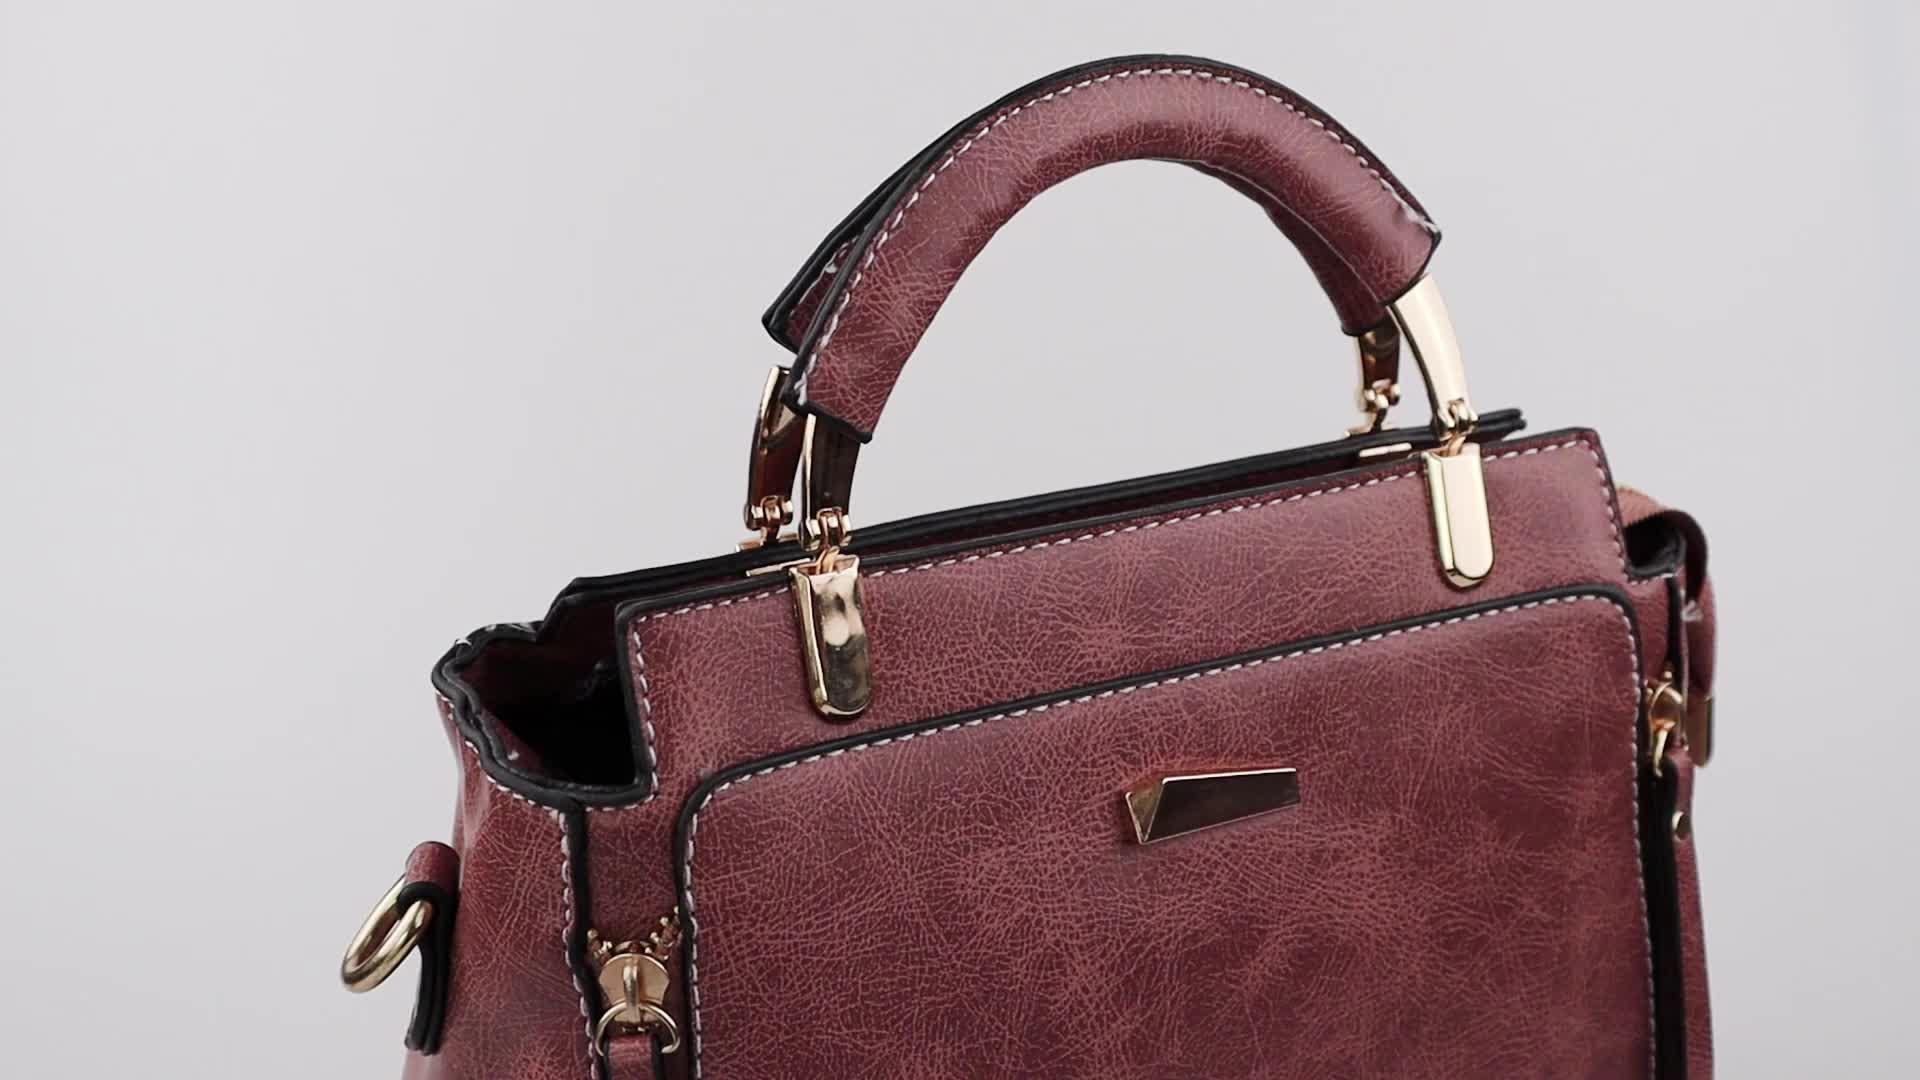 2019 Classic High Quality Women Bag Leather Handbag For Lady